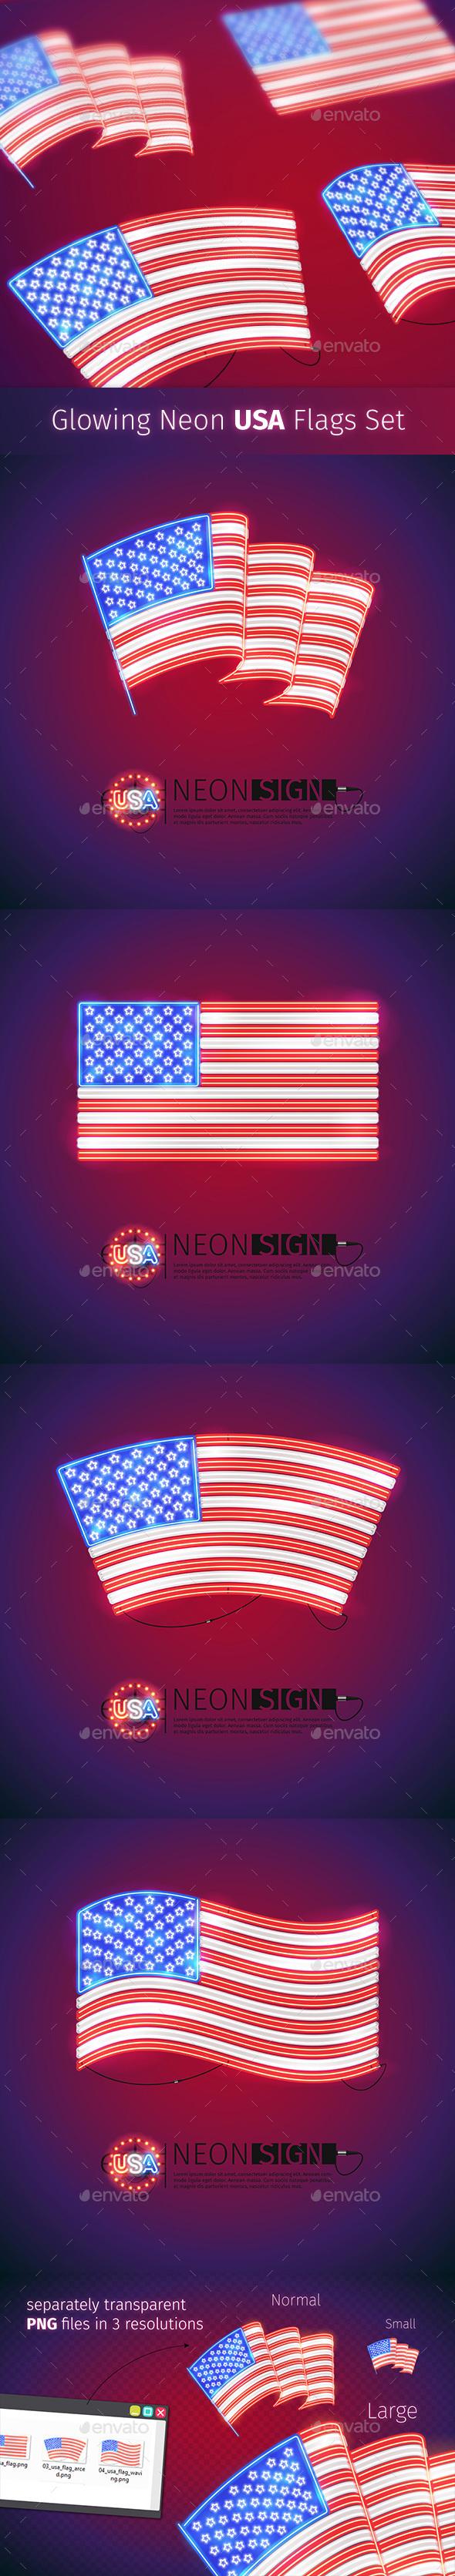 Glowing Neon USA Flags Set